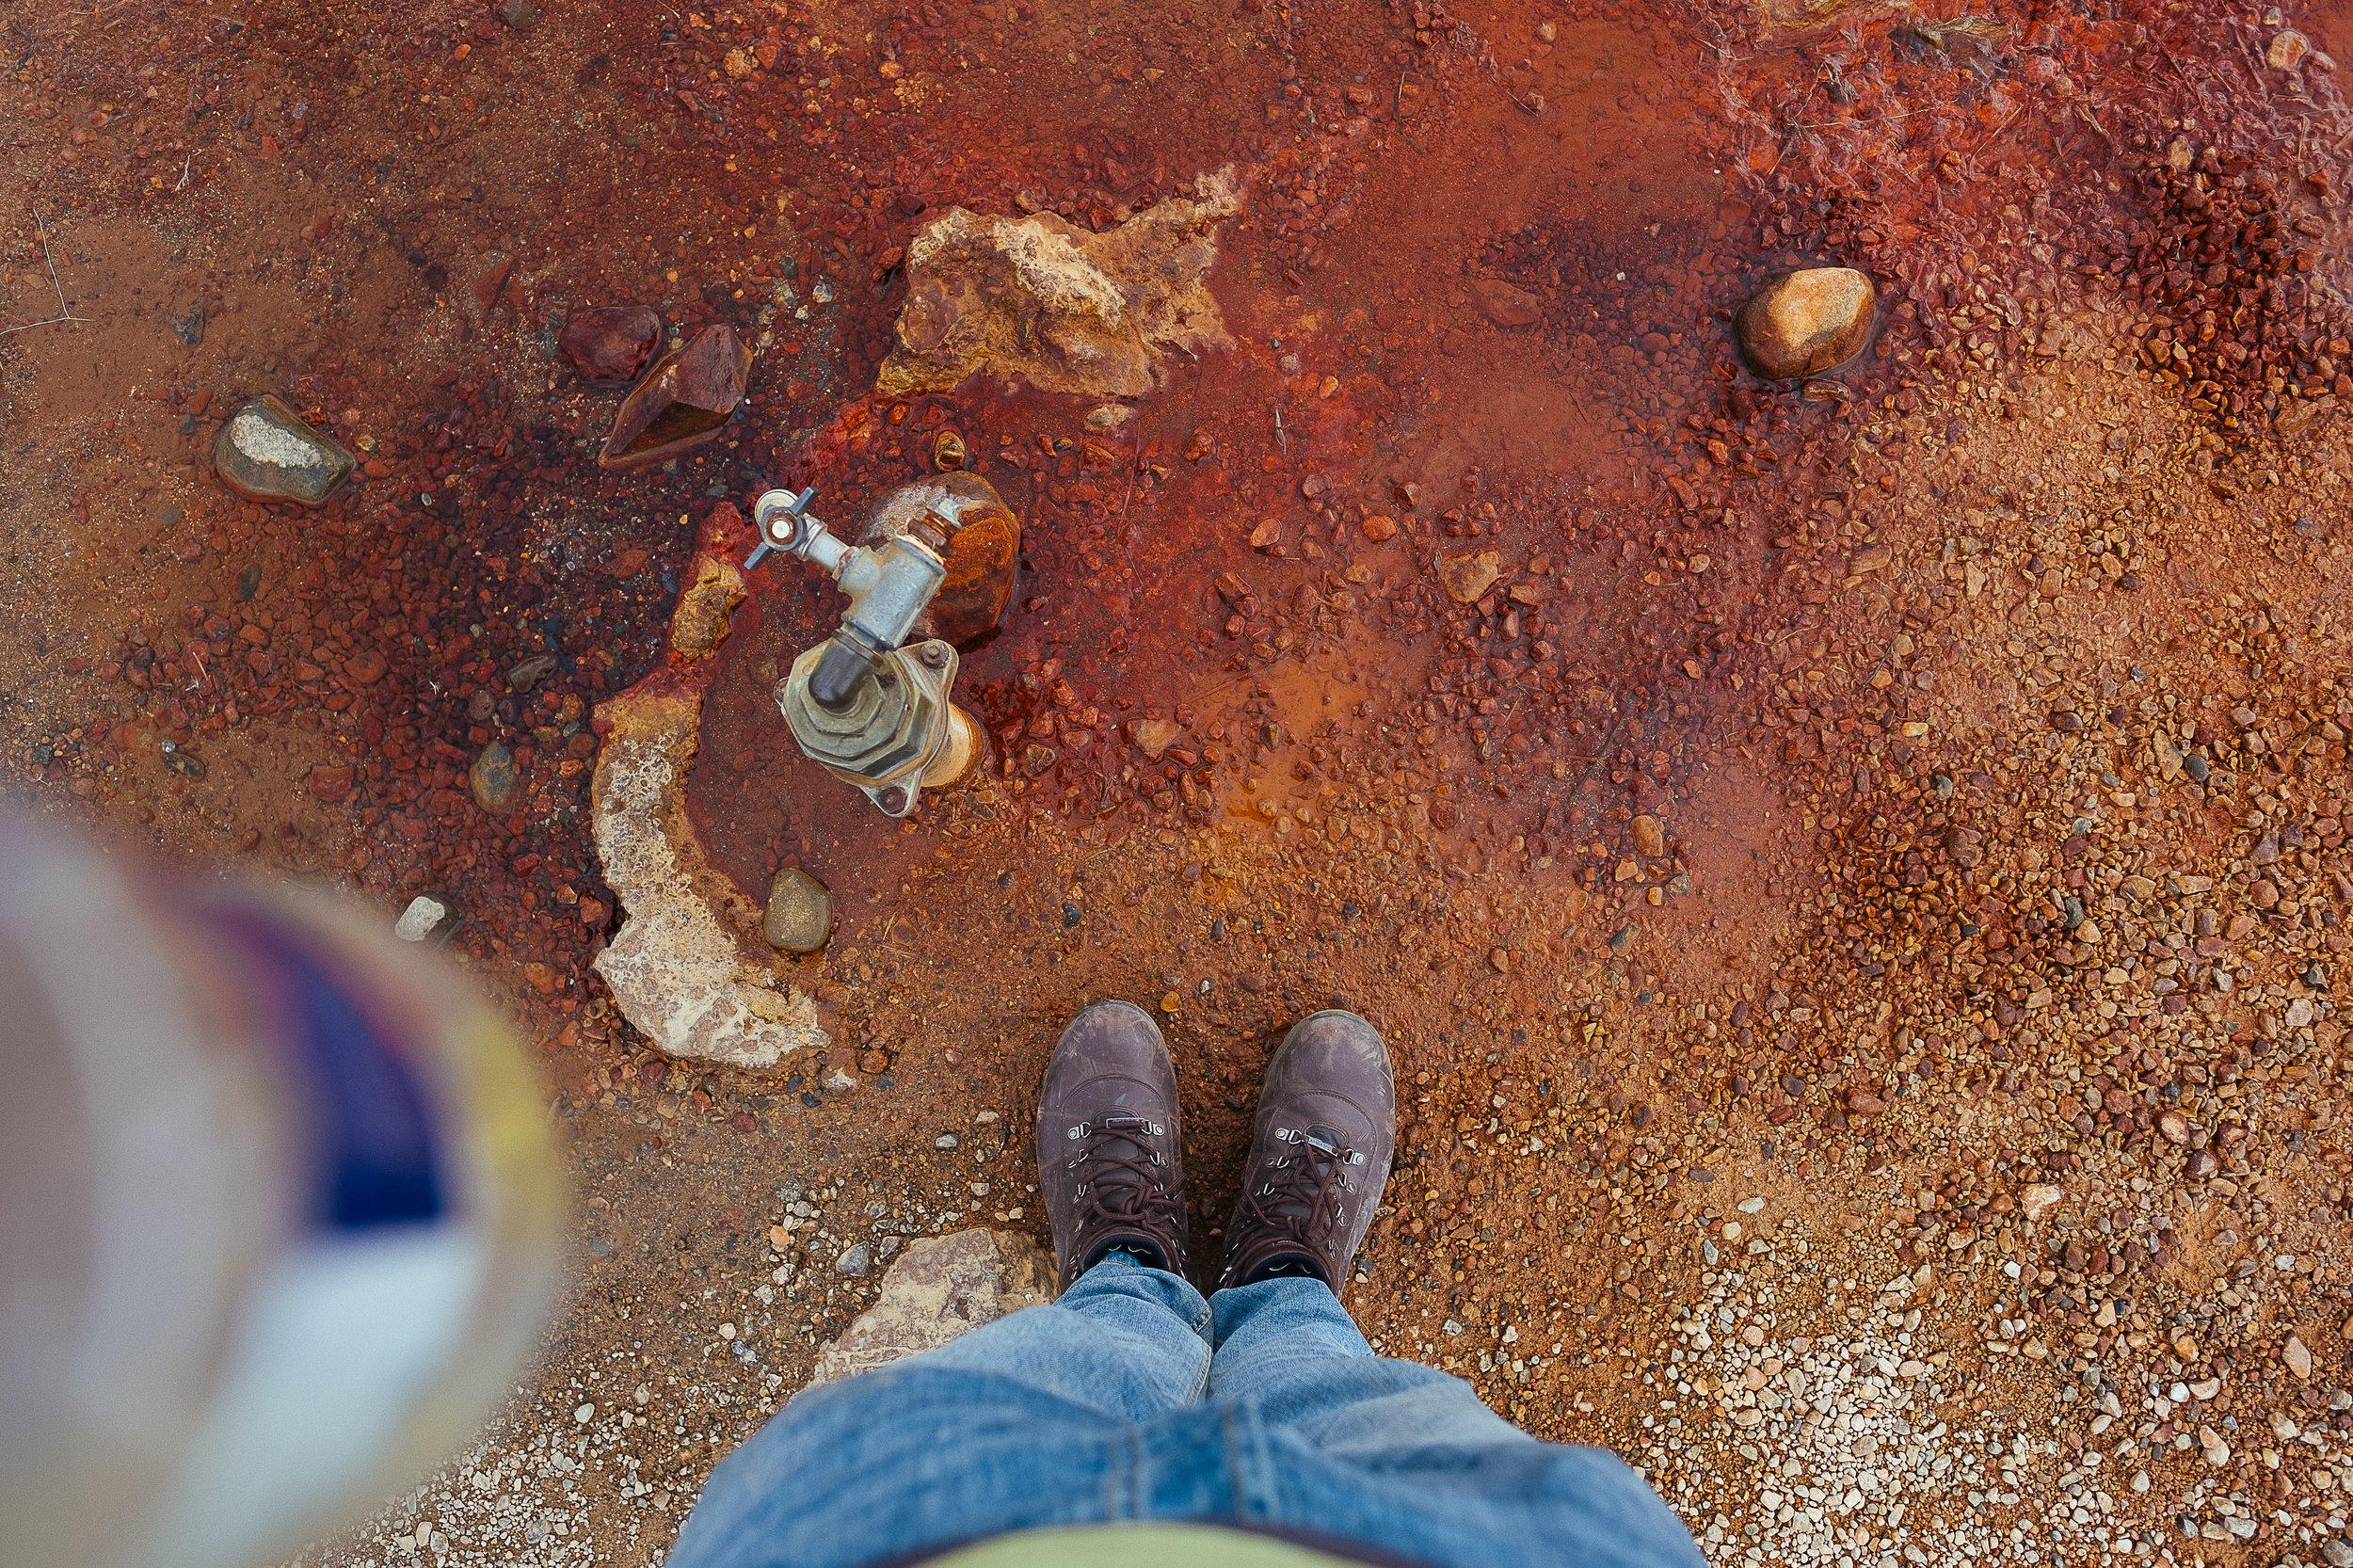 iceland feet-1.jpg